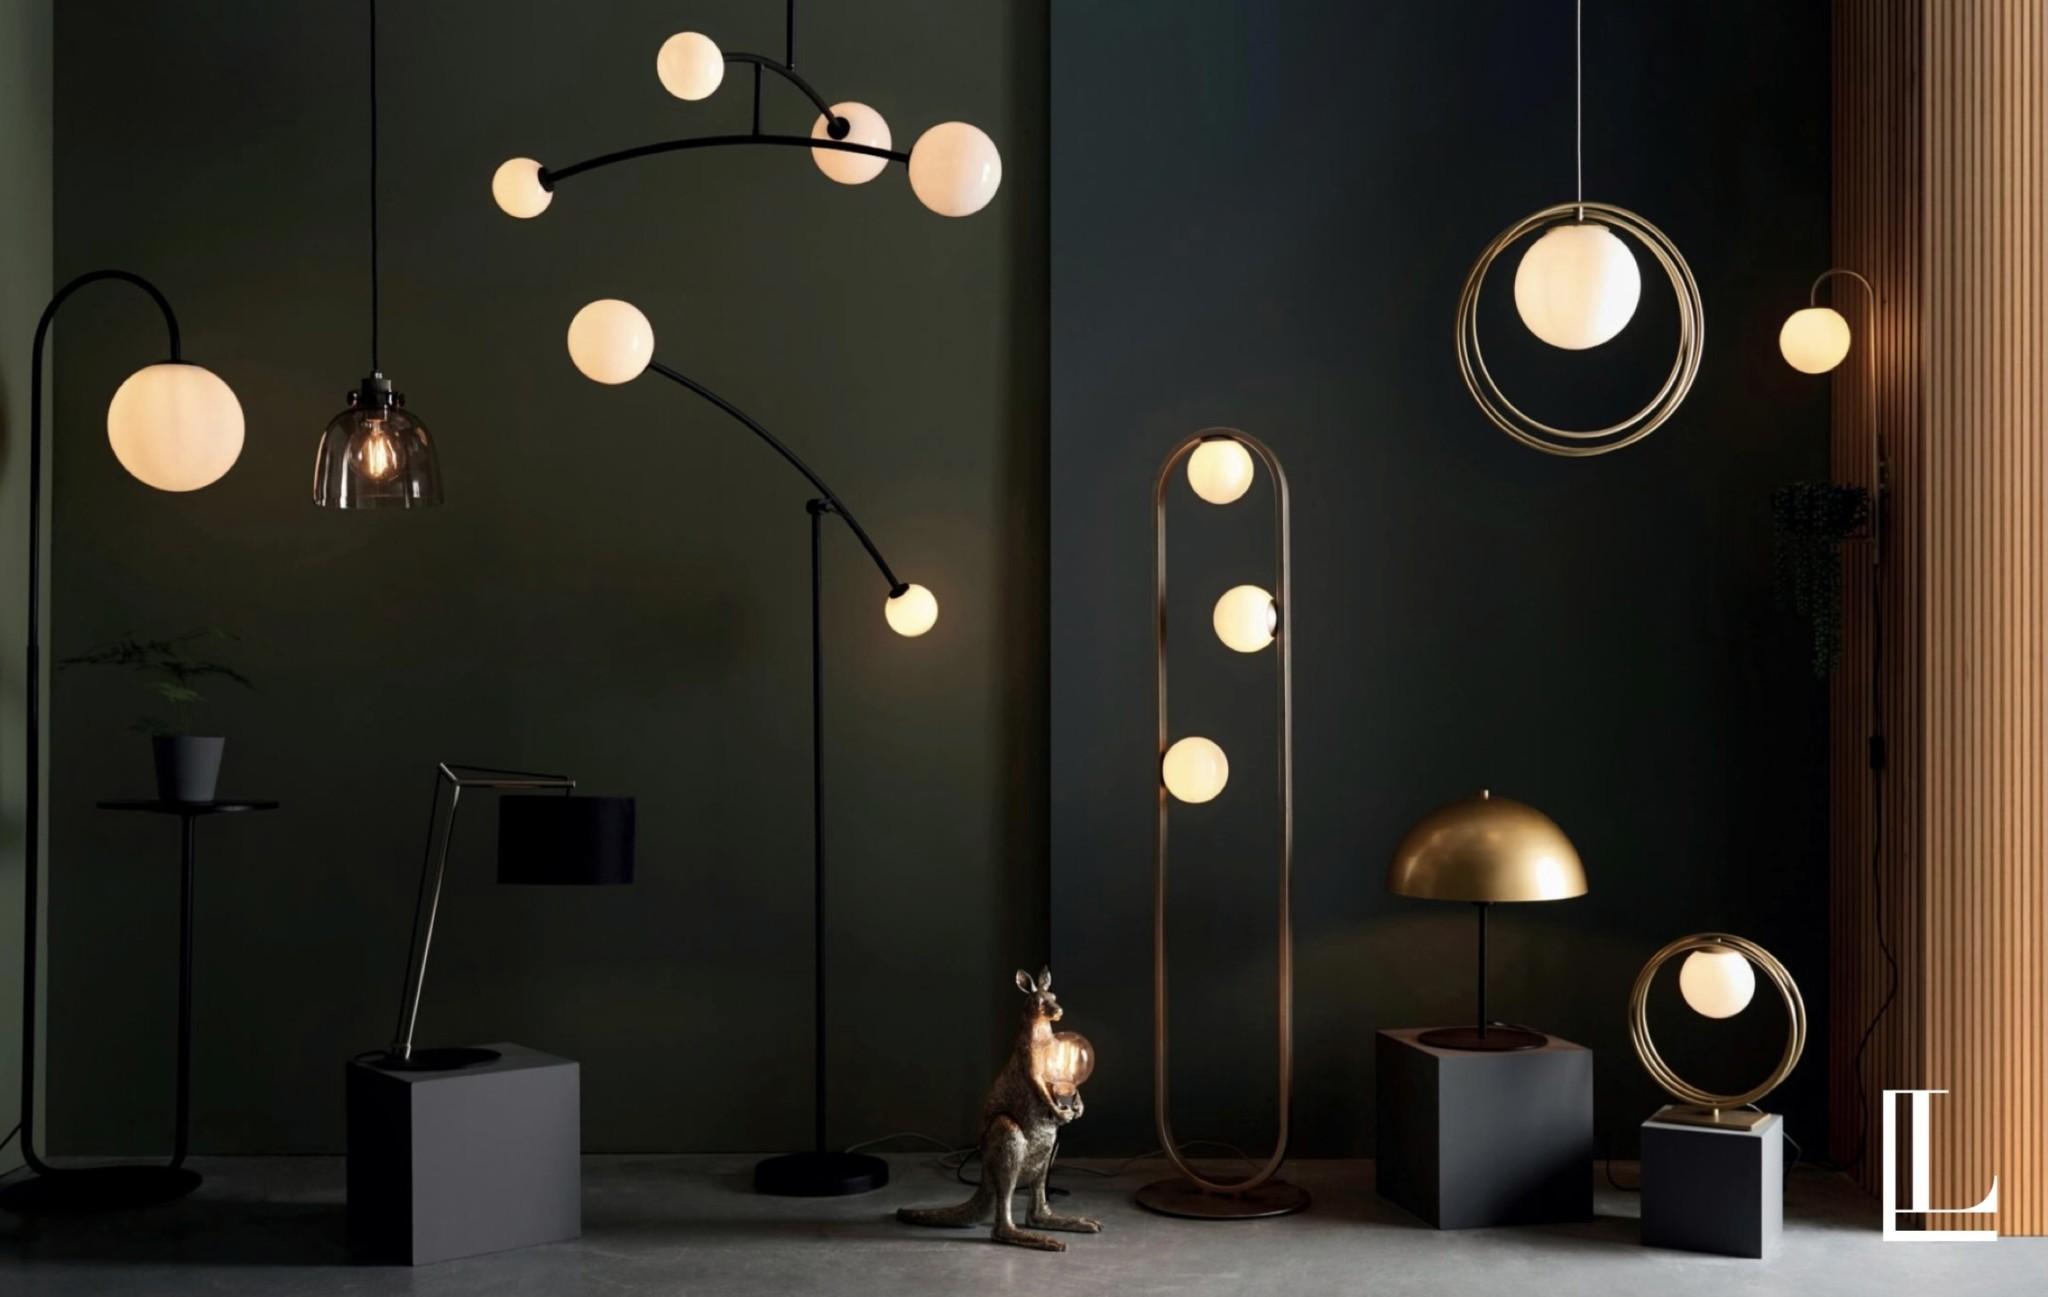 Orb lights